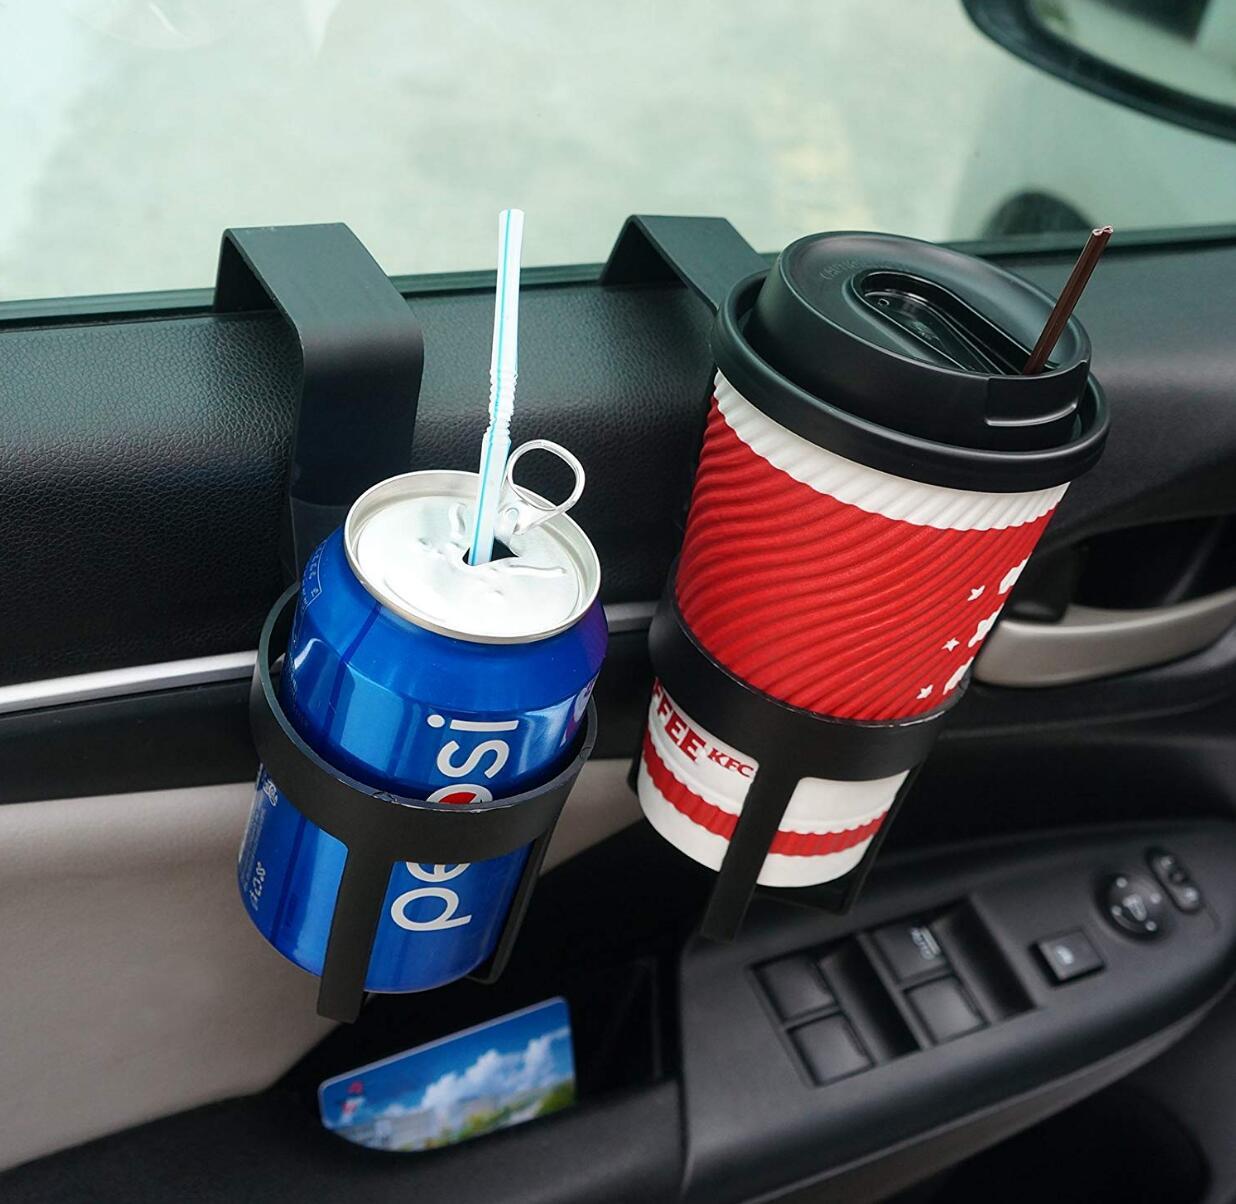 Car Drinks Cup Bottle Can Mount Holder Stand For Suzuki Ltz 400 Audi Q5 Kia Sportage Citroen Xsara Seat Ibiza 6j Peugeot 3008 Car Tax Disc Holders Aliexpress